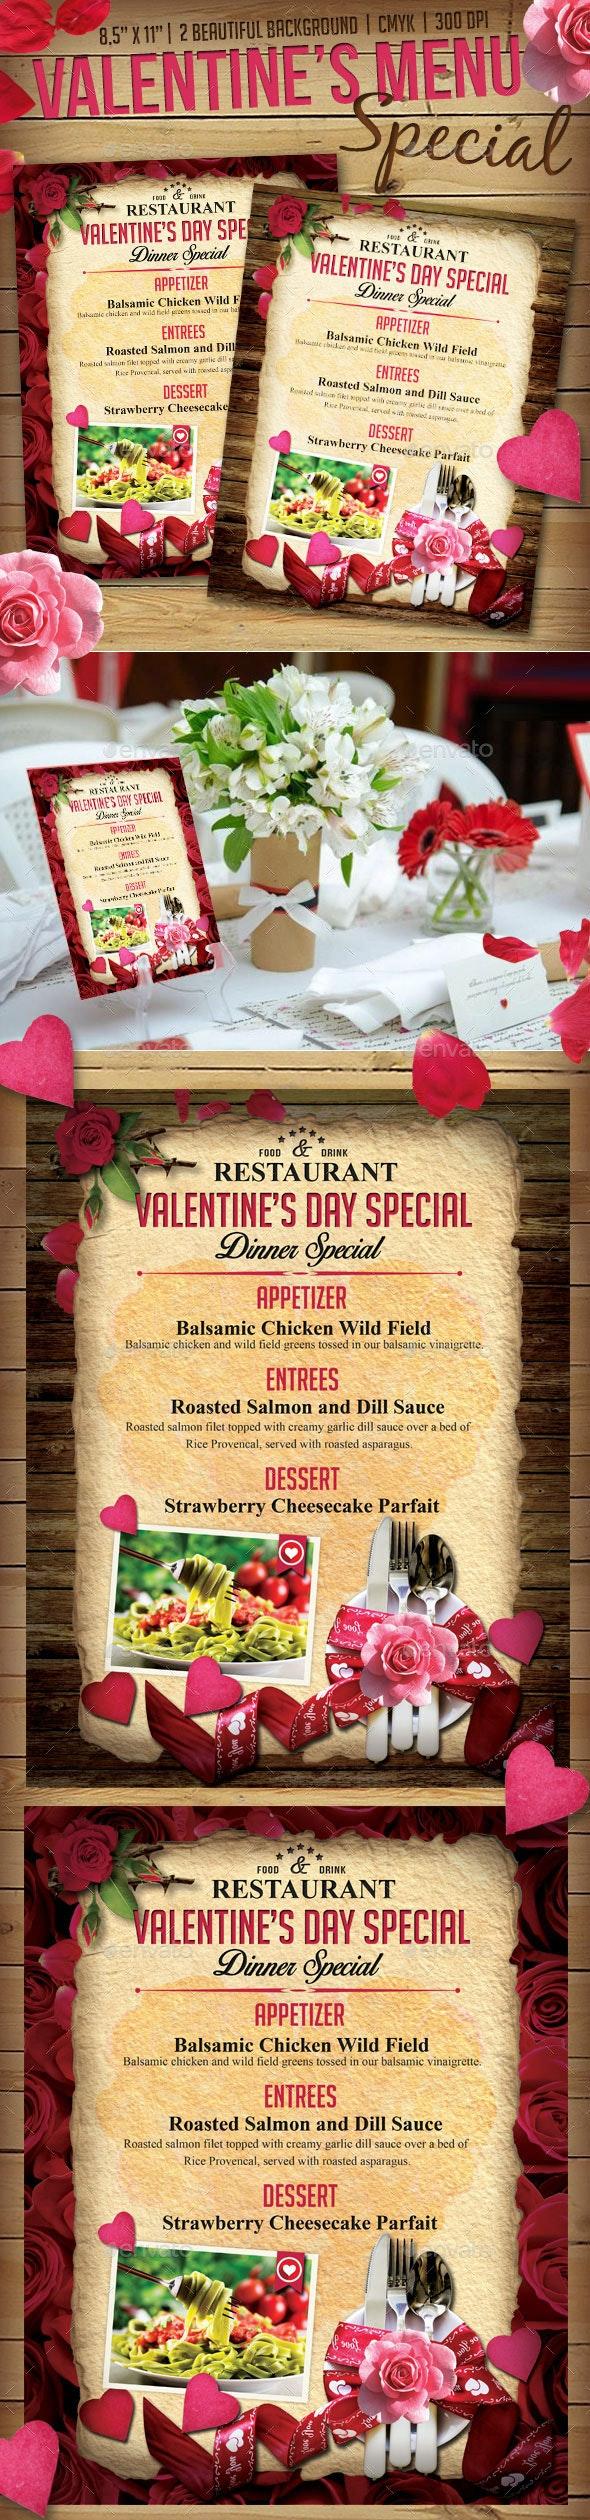 Valentine Menu Flyer Templates - Holidays Events